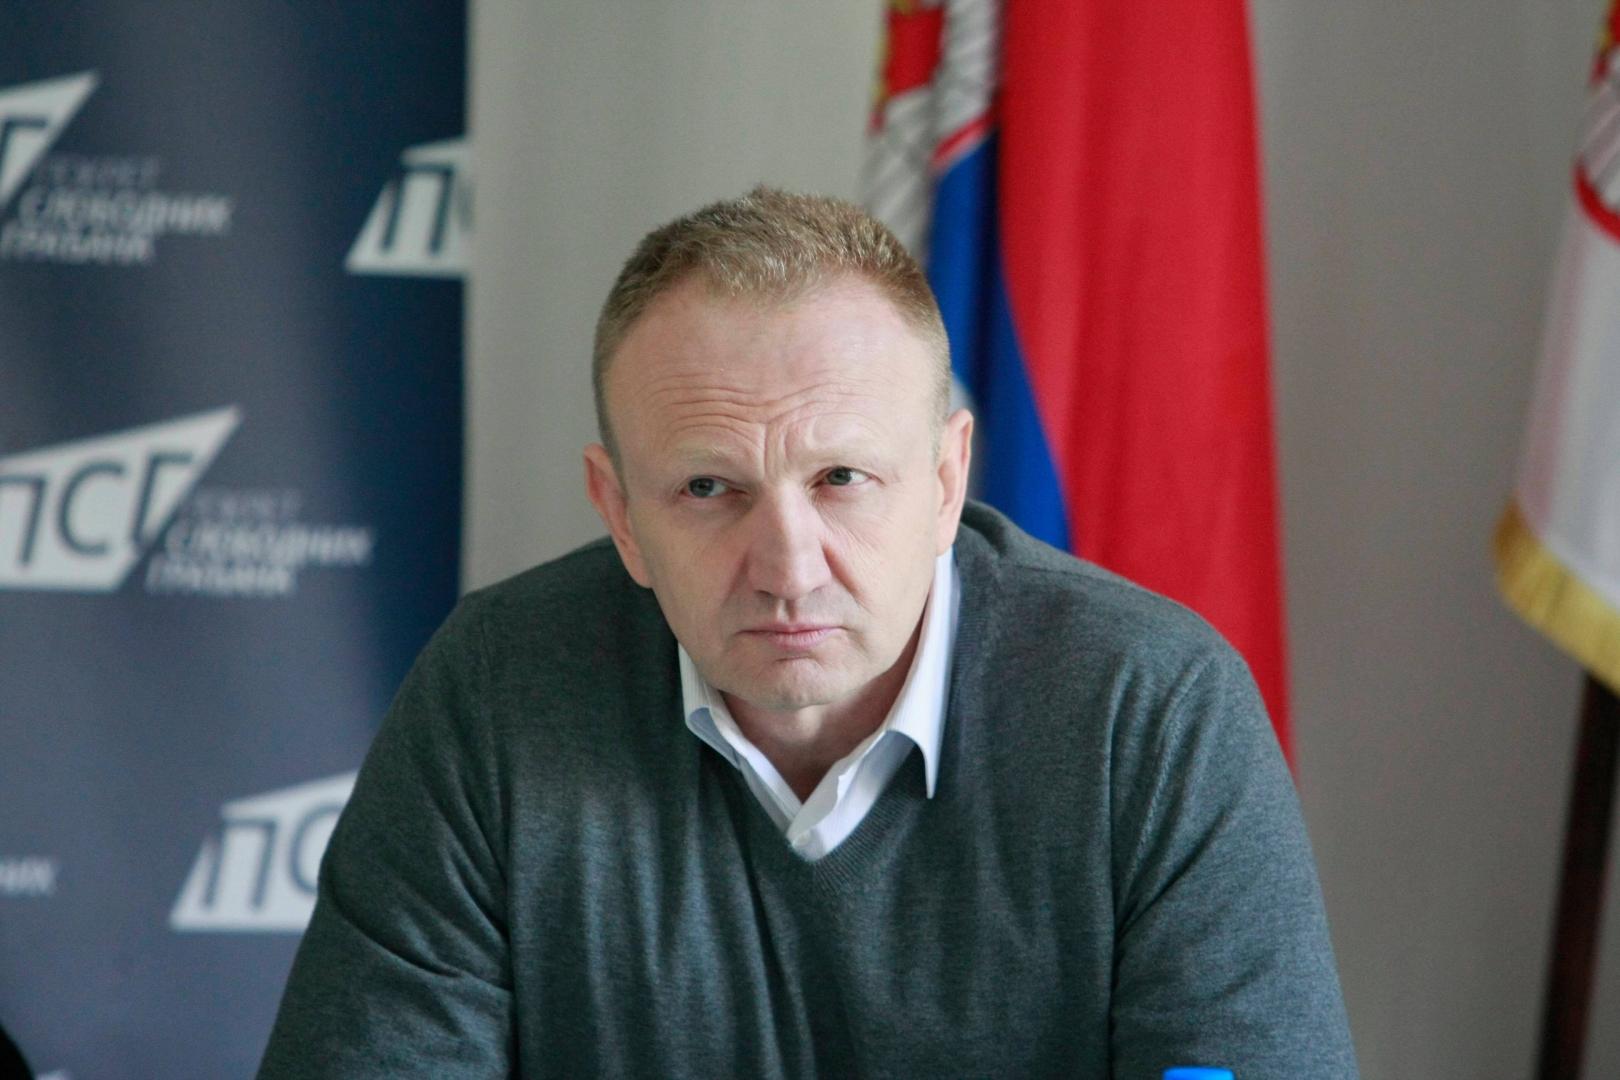 Драган Джилас, мэр Белграда в 2008—2014 гг